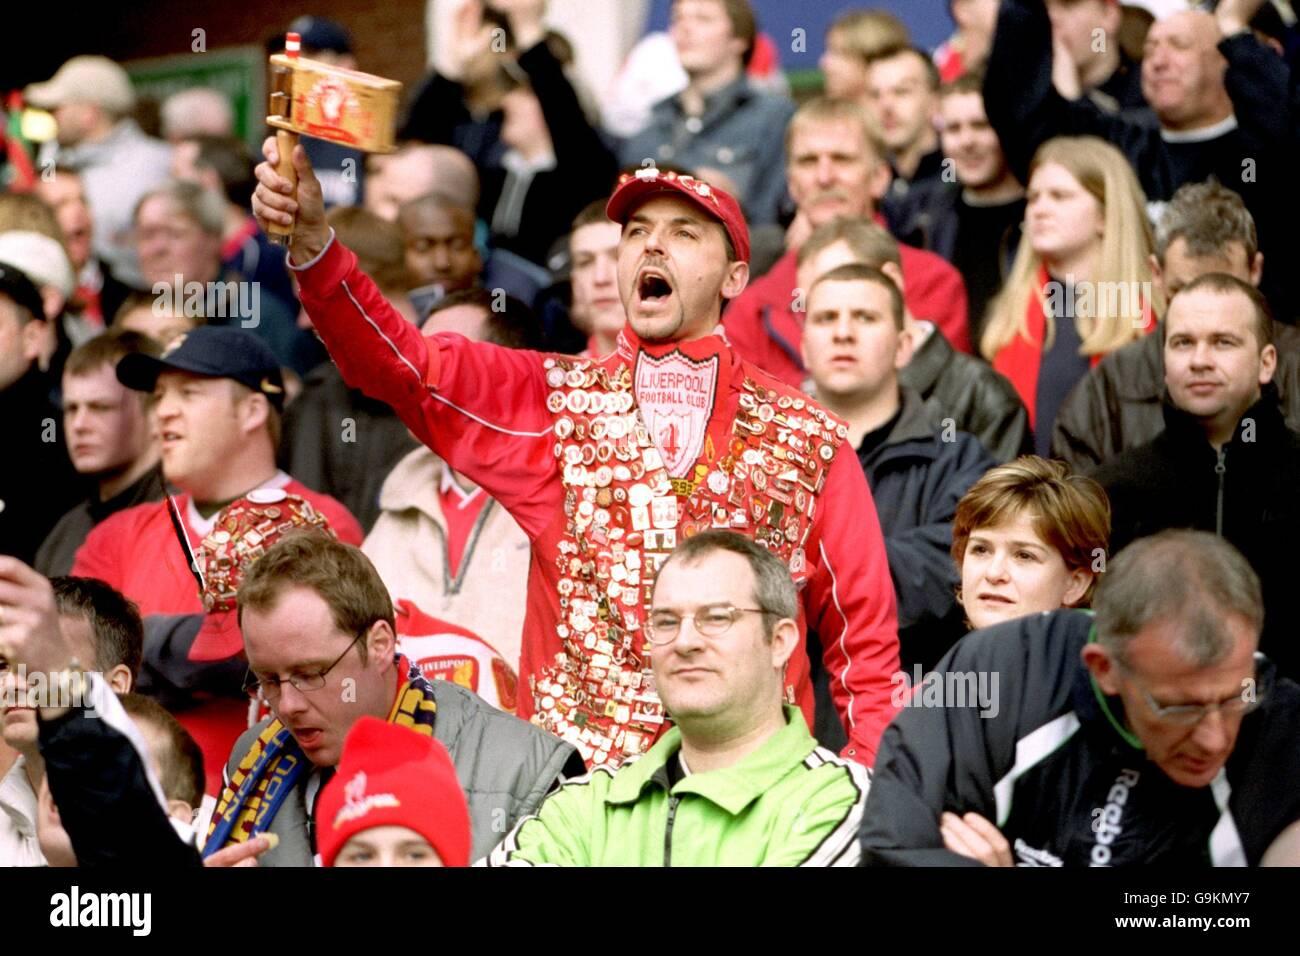 Football - Coupe de AXA - Semi Final - Liverpool v Wycombe Wanderers Photo Stock